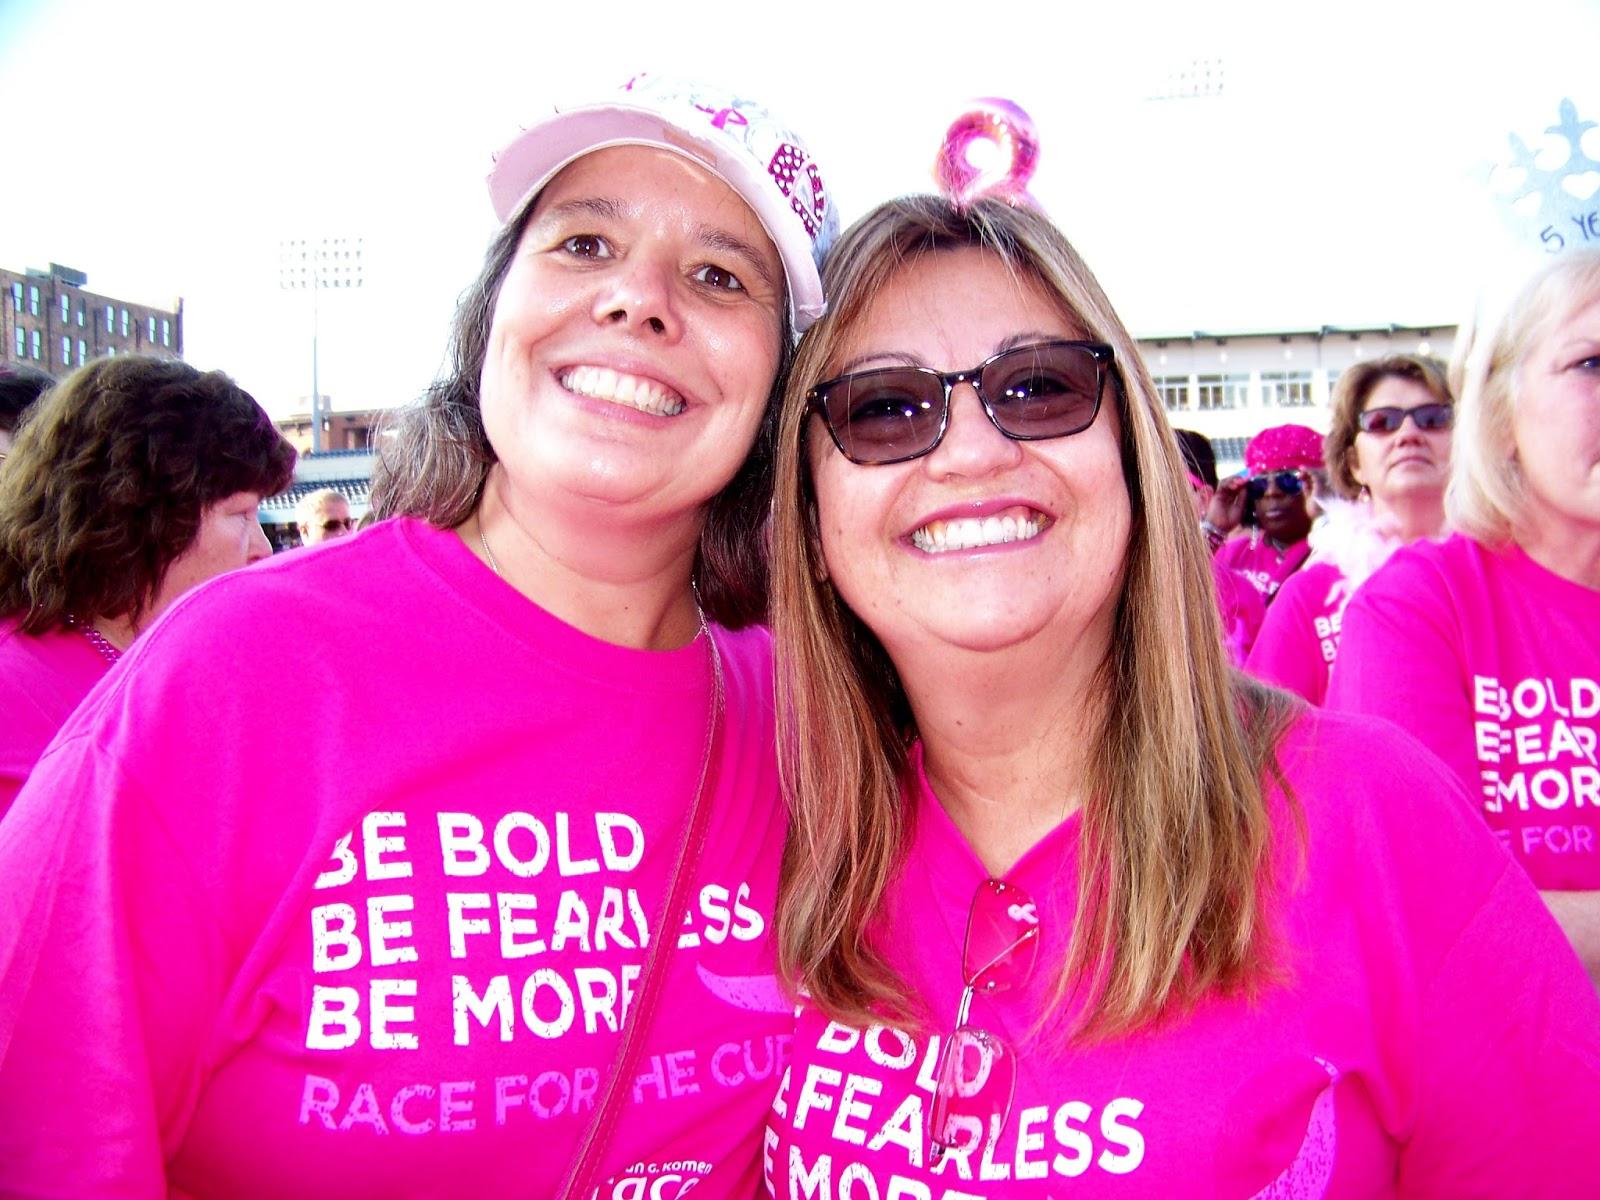 When Are You a Breast Cancer Survivor? - verywellhealth.com